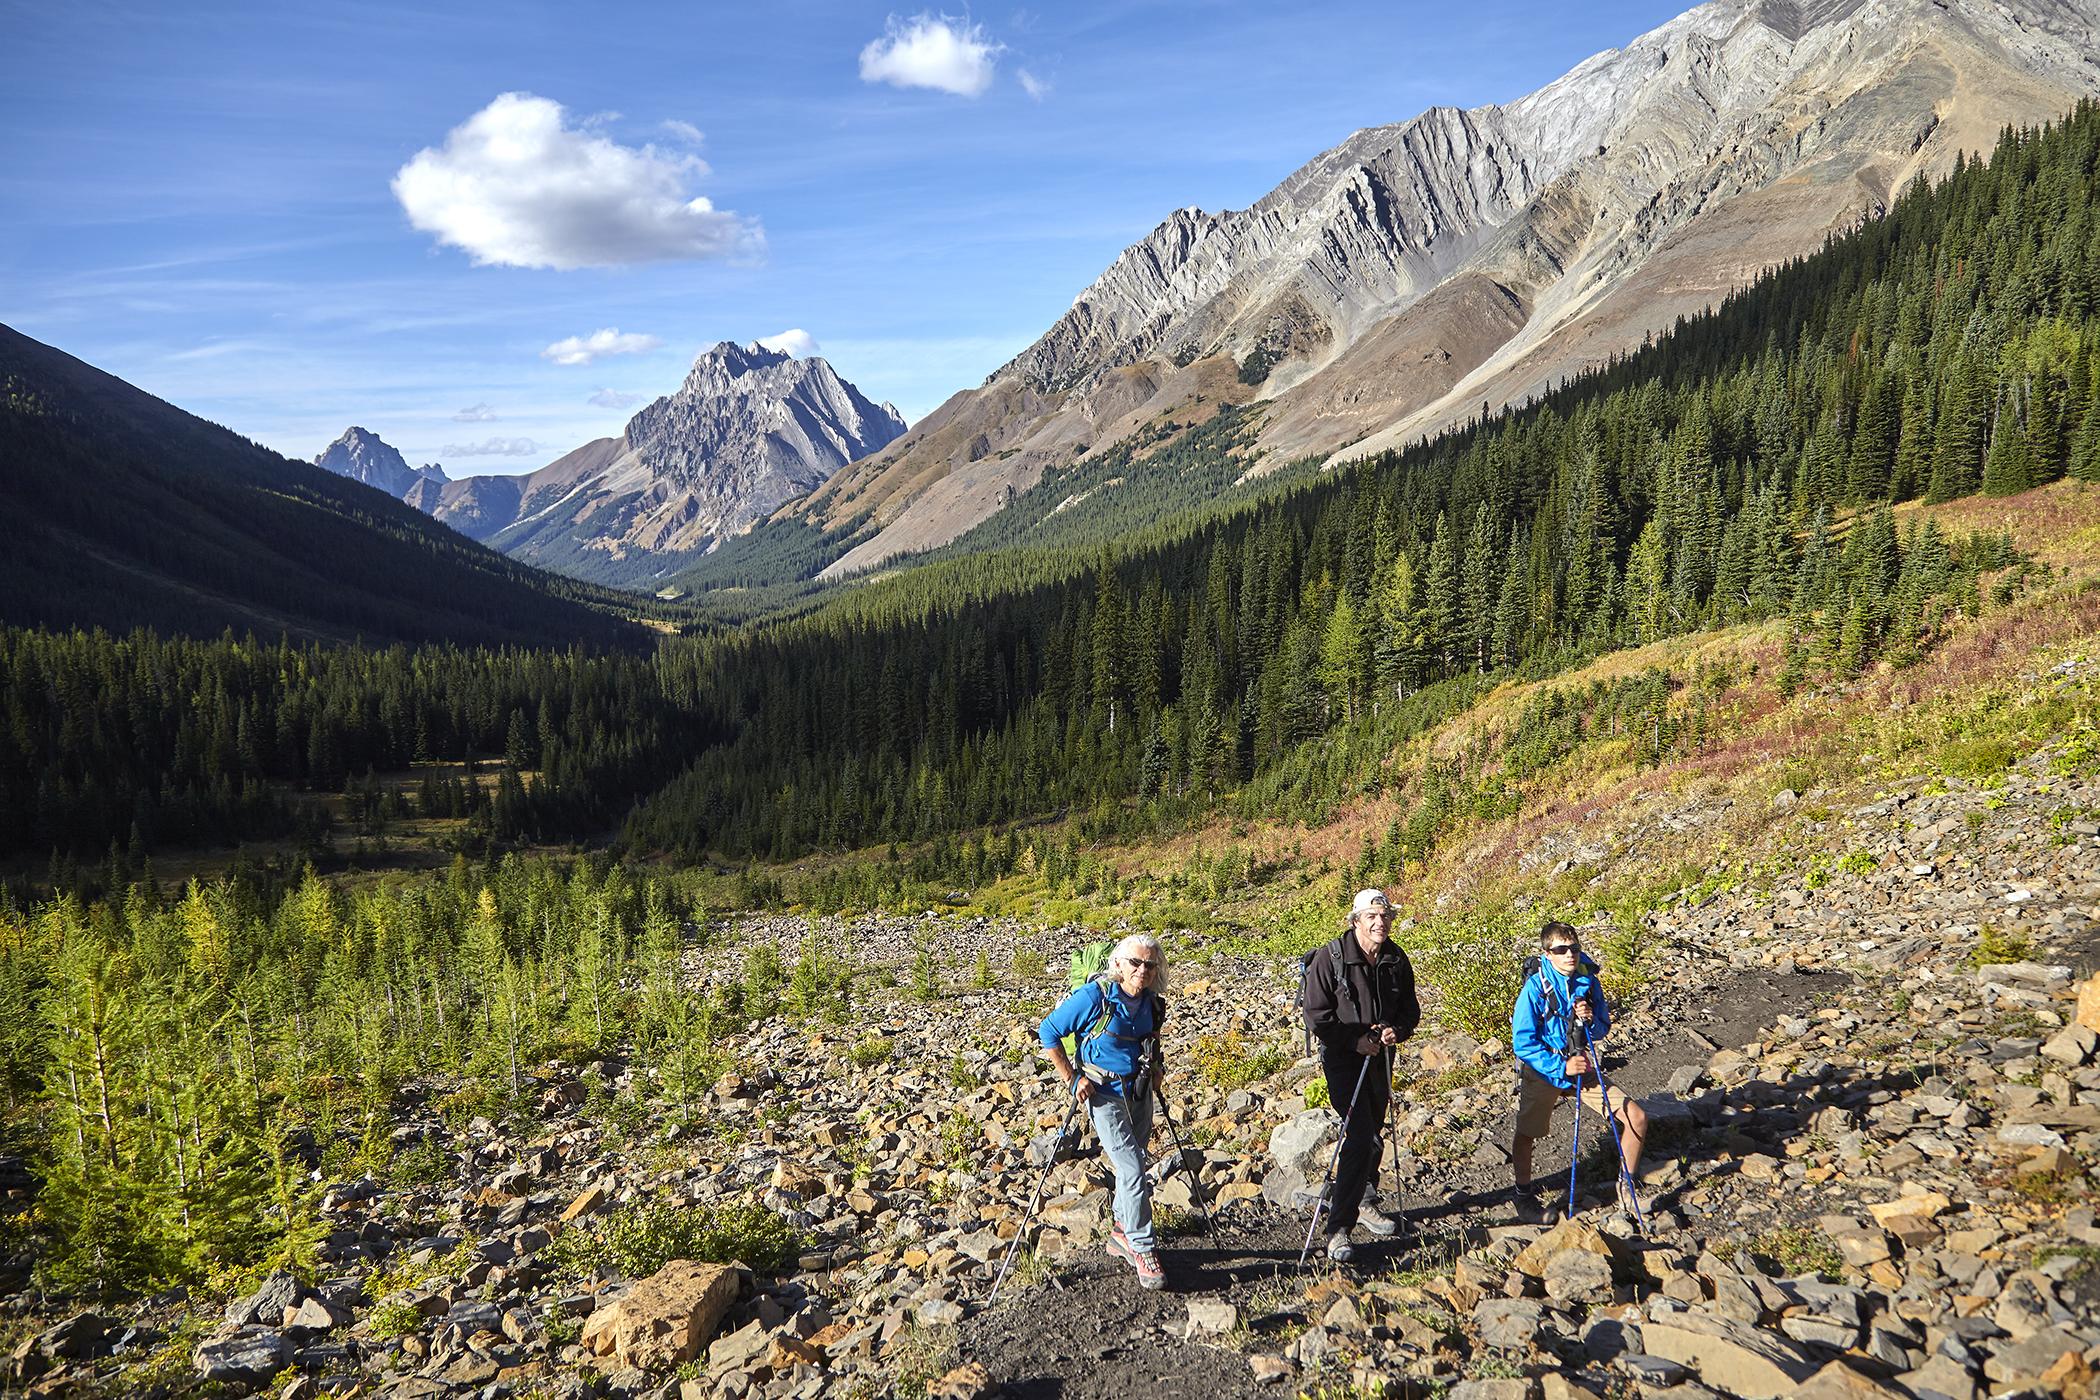 Milan, Wayne and Yuri on the approach to Mount Tyrwhitt.